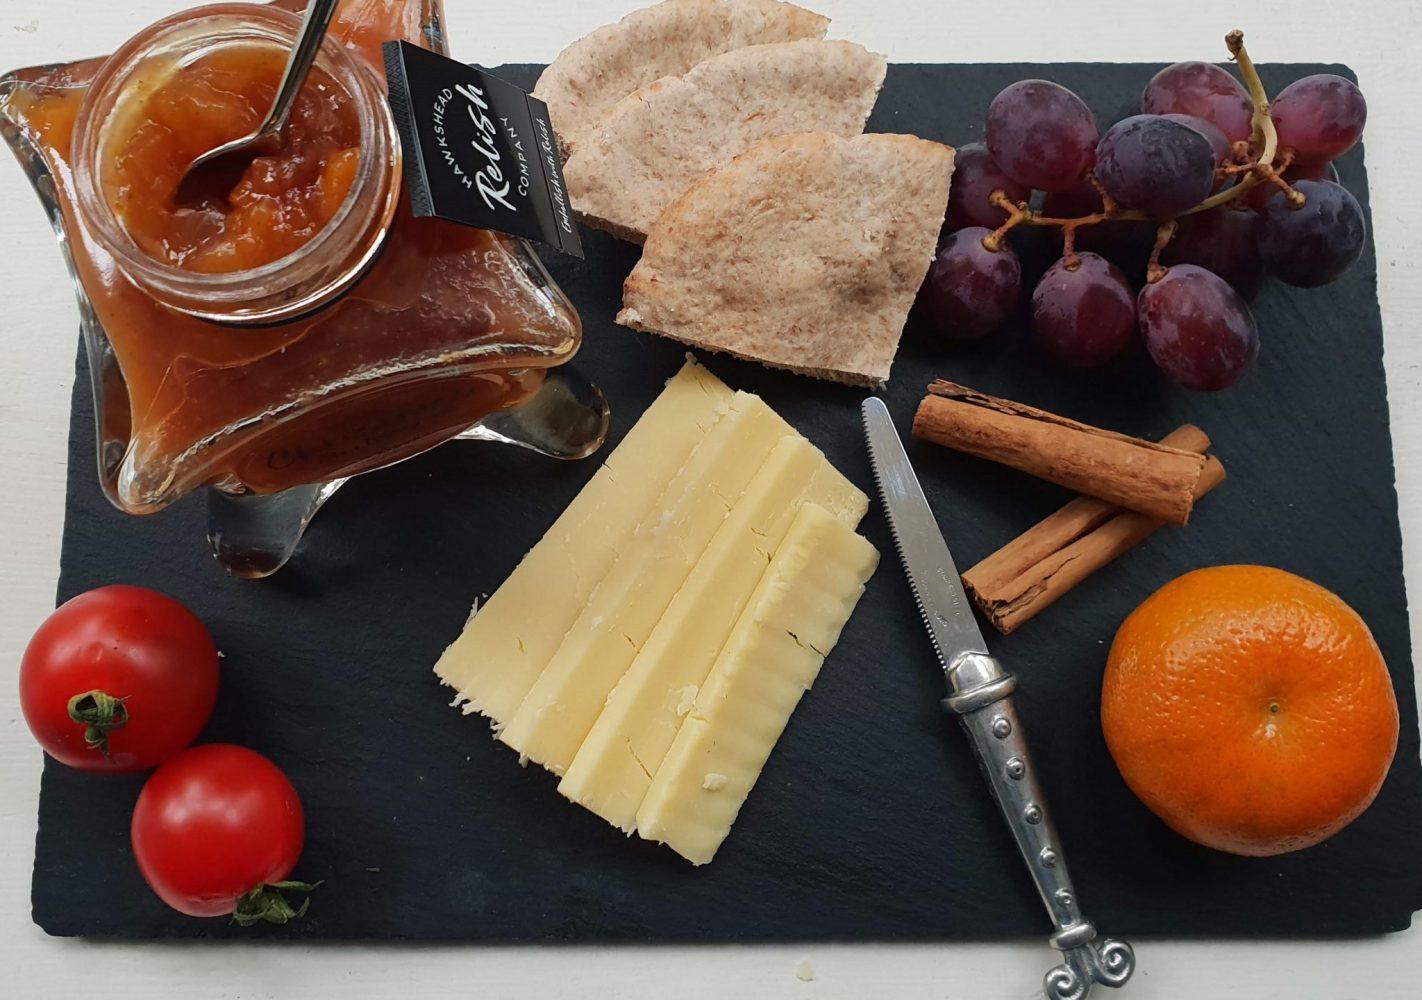 Hawkshead christmas chutney with cheese